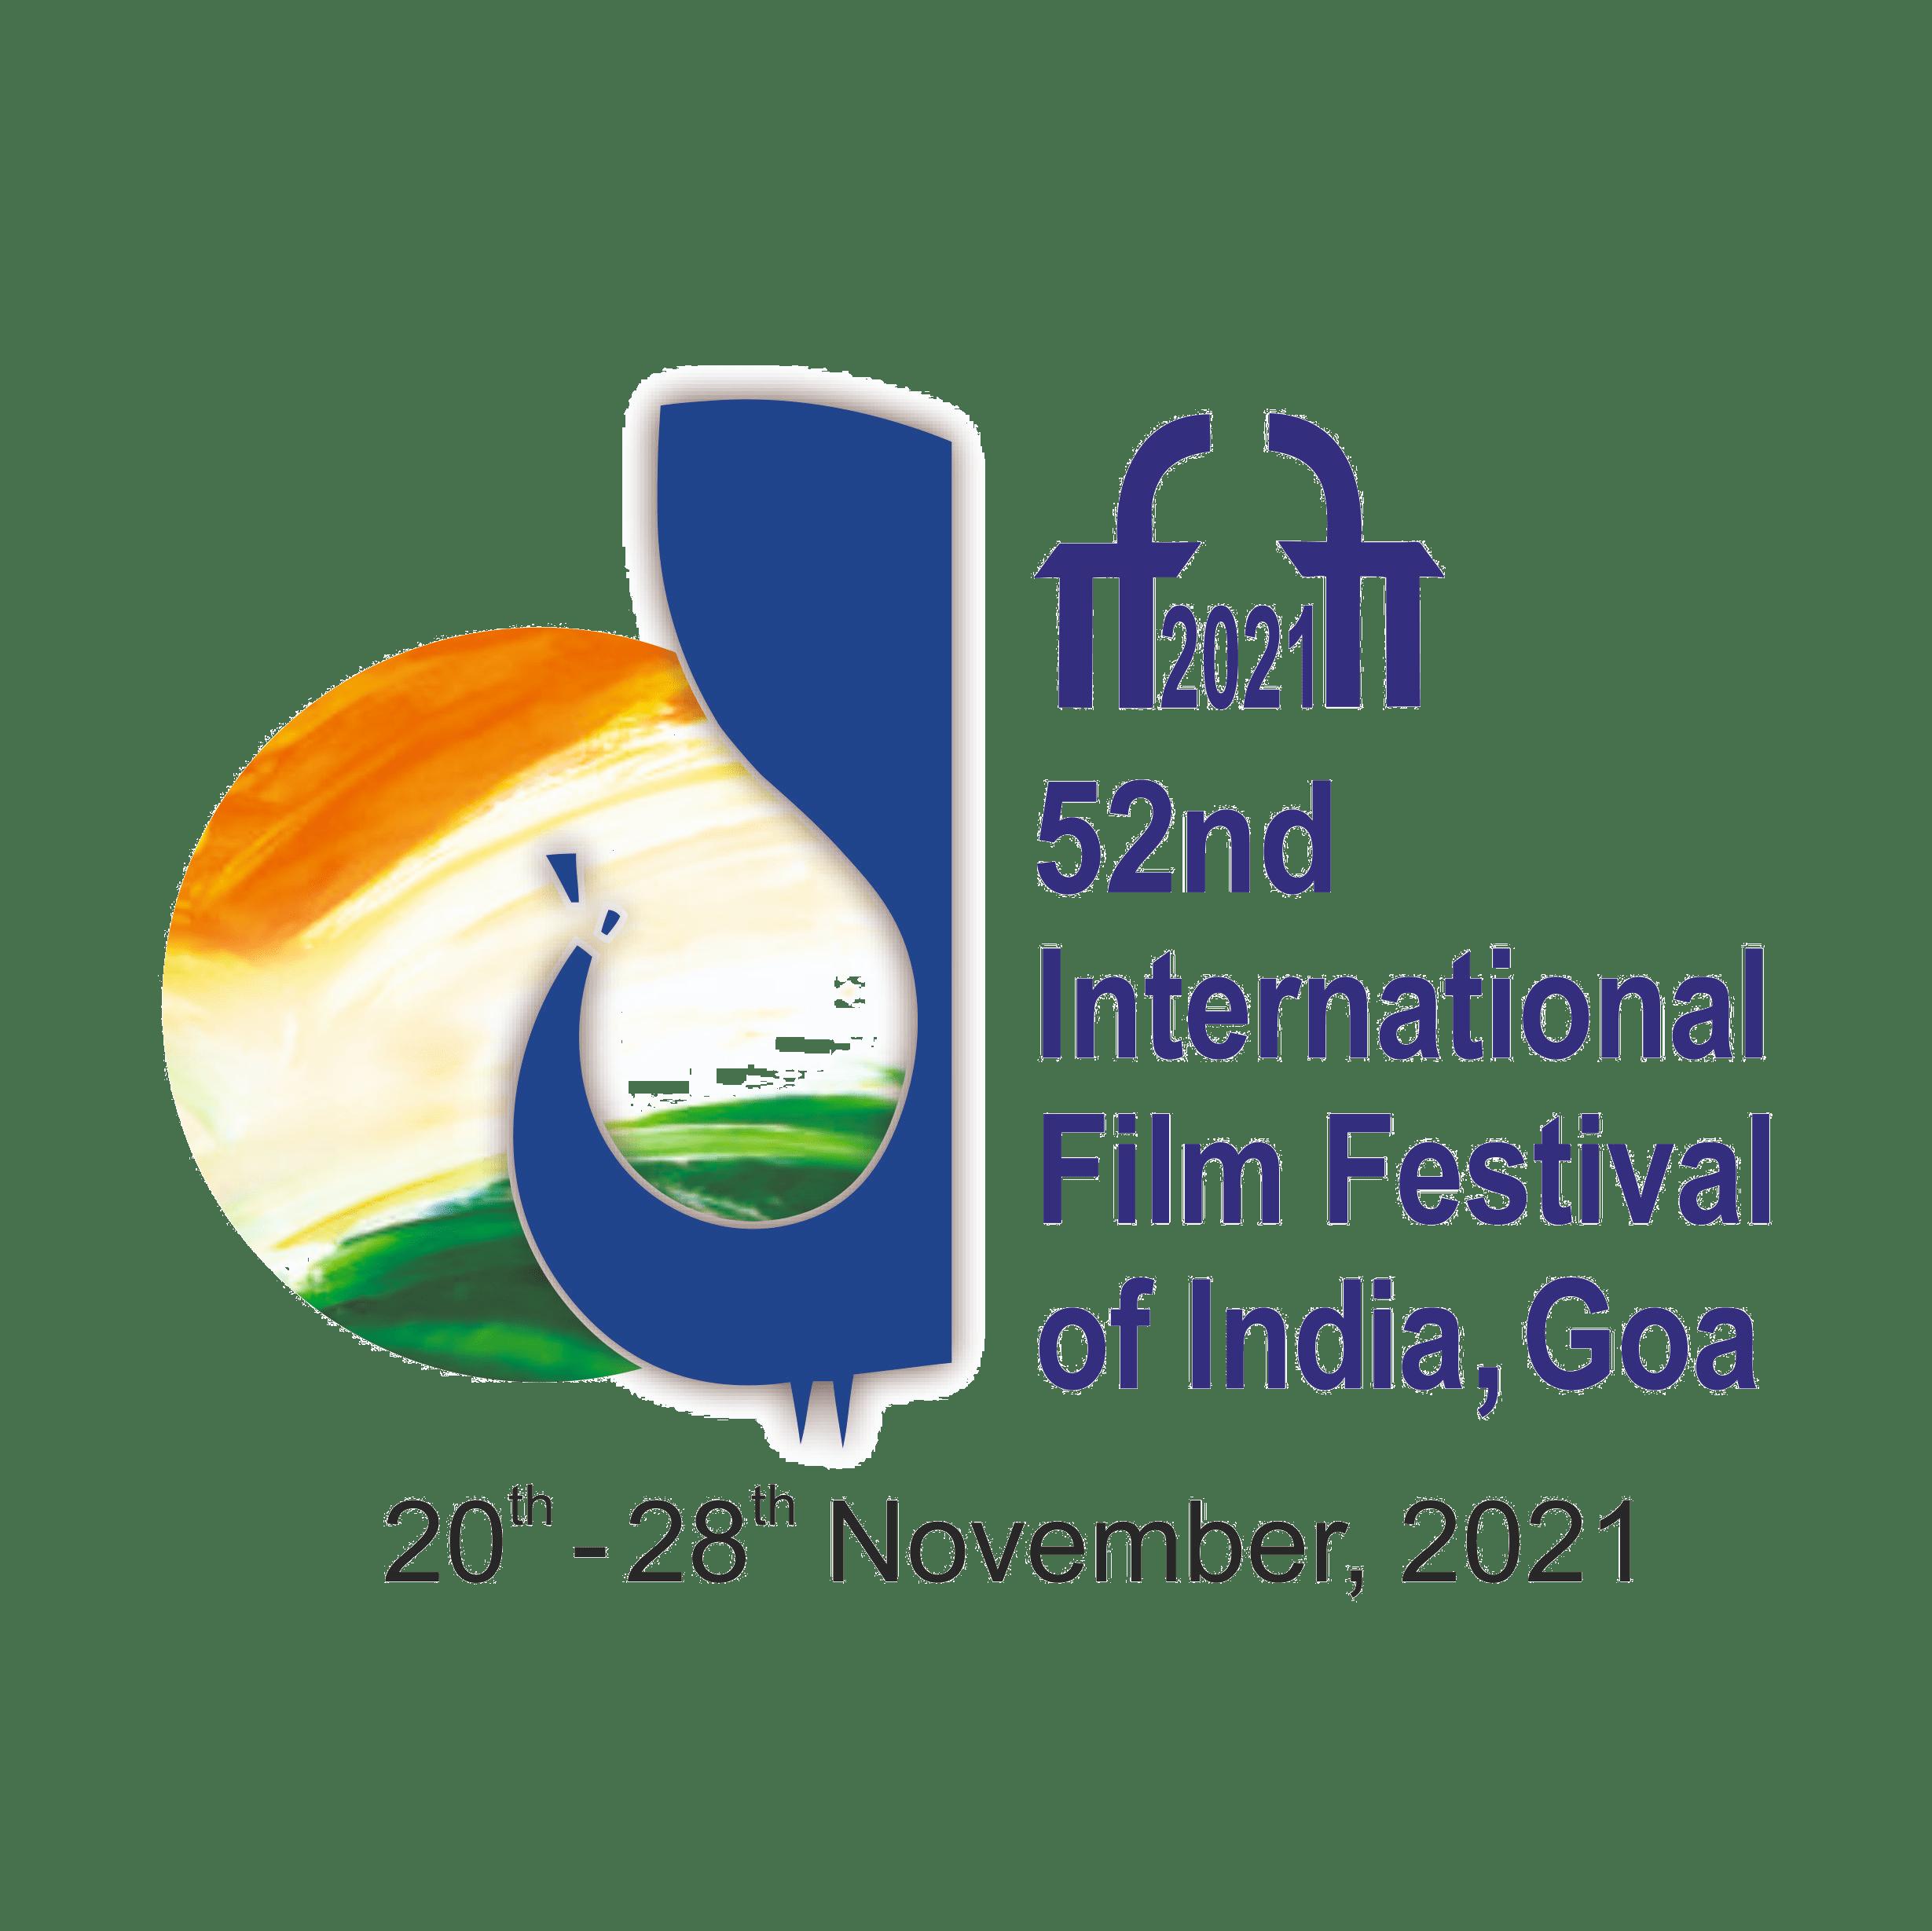 international-film-festival-of-india-in-goa-lifetime-achievement-award-will-go-to-szabo-scorsese